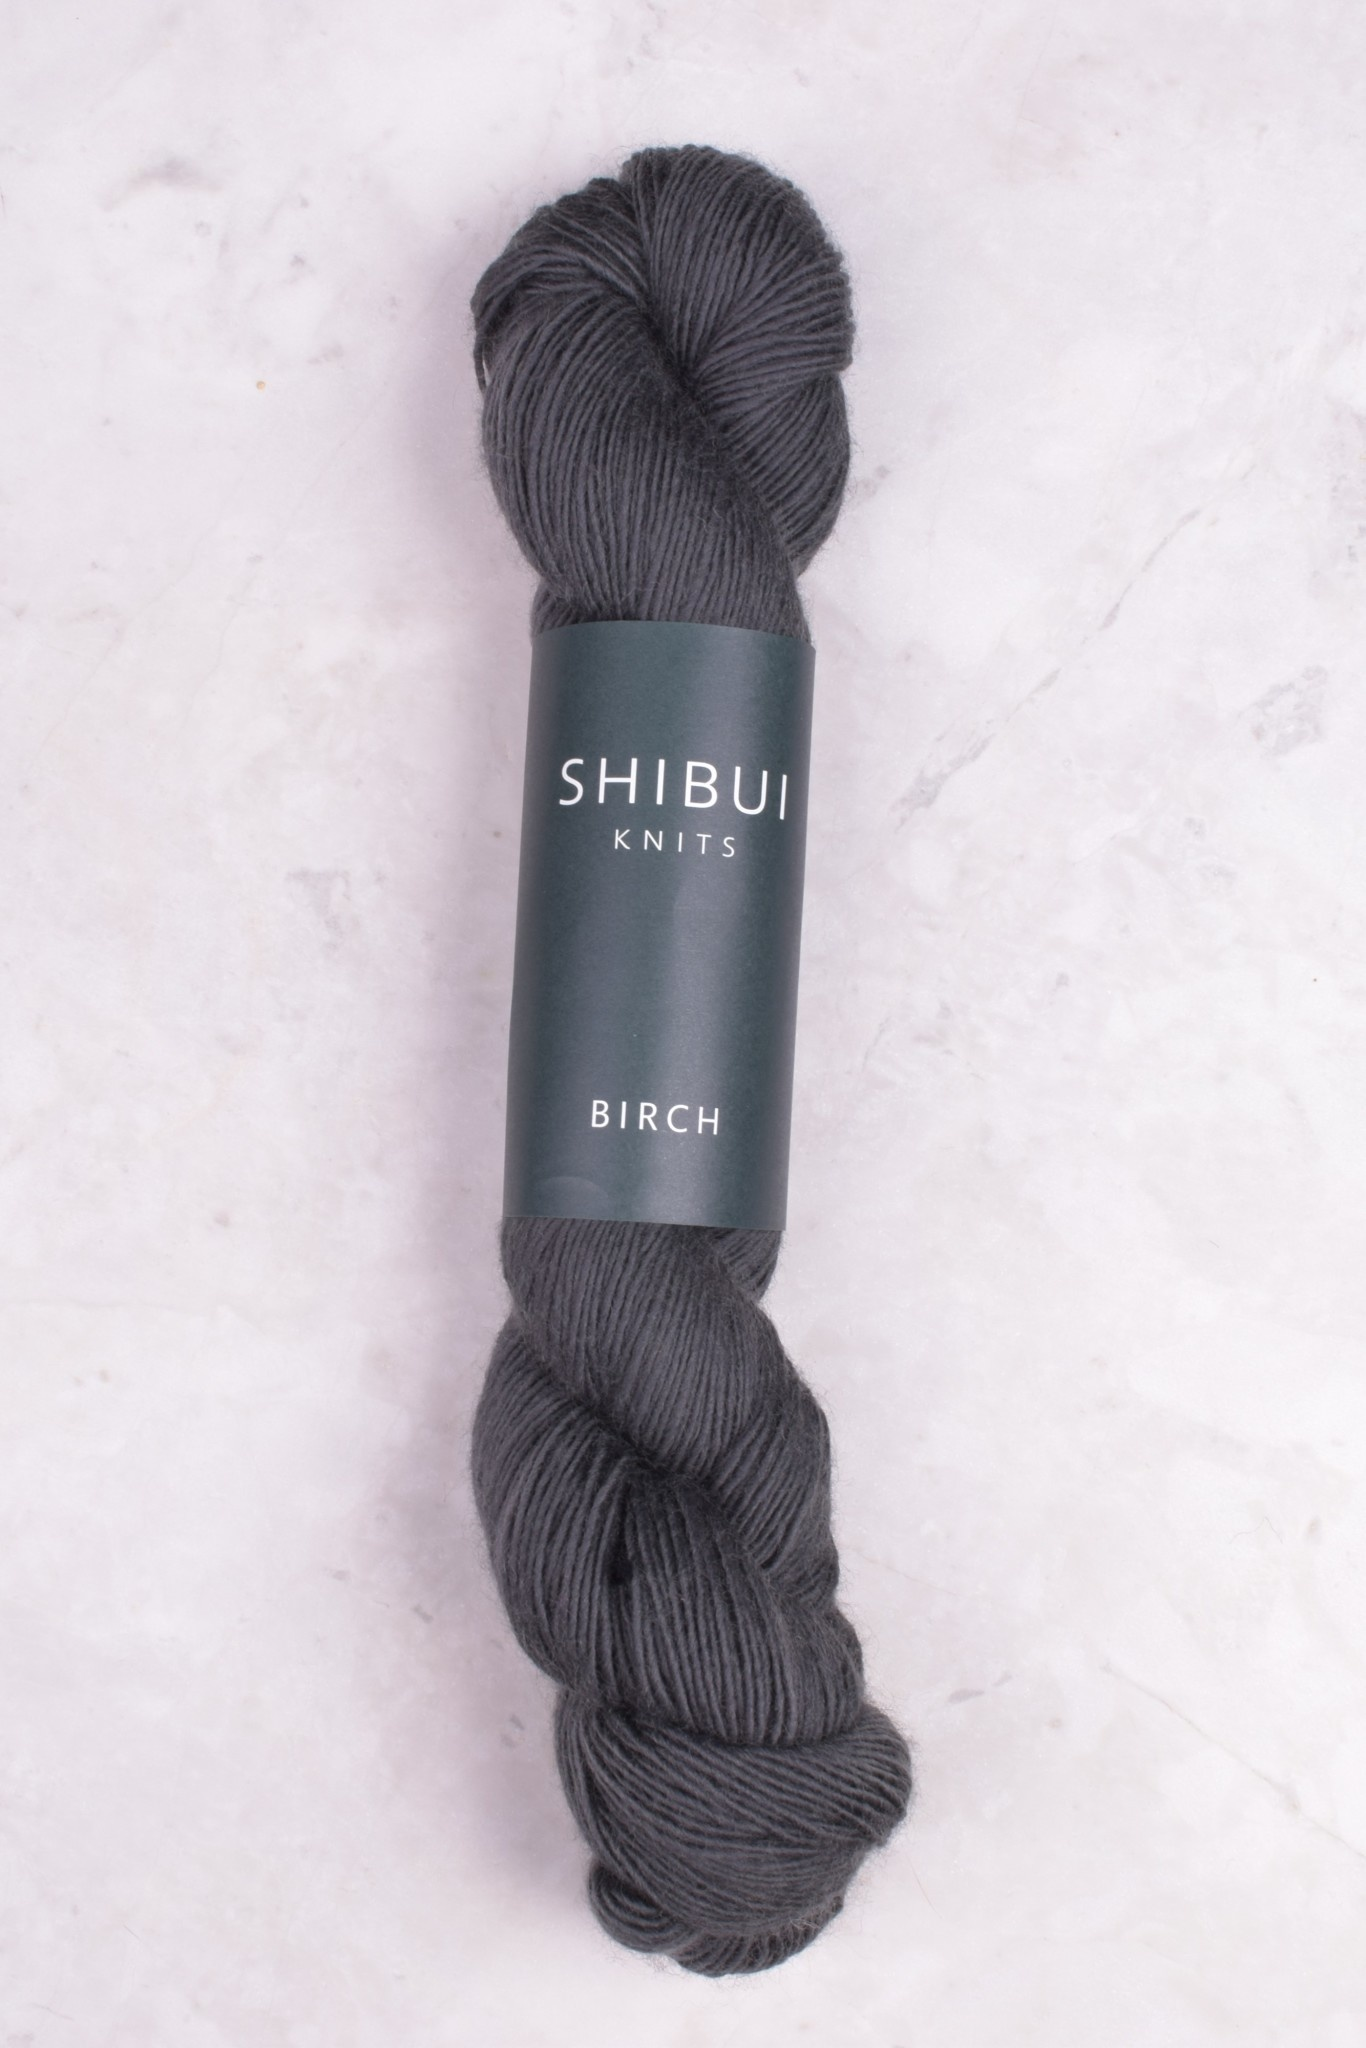 Image of Shibui Birch 11 Tar (Discontinued)